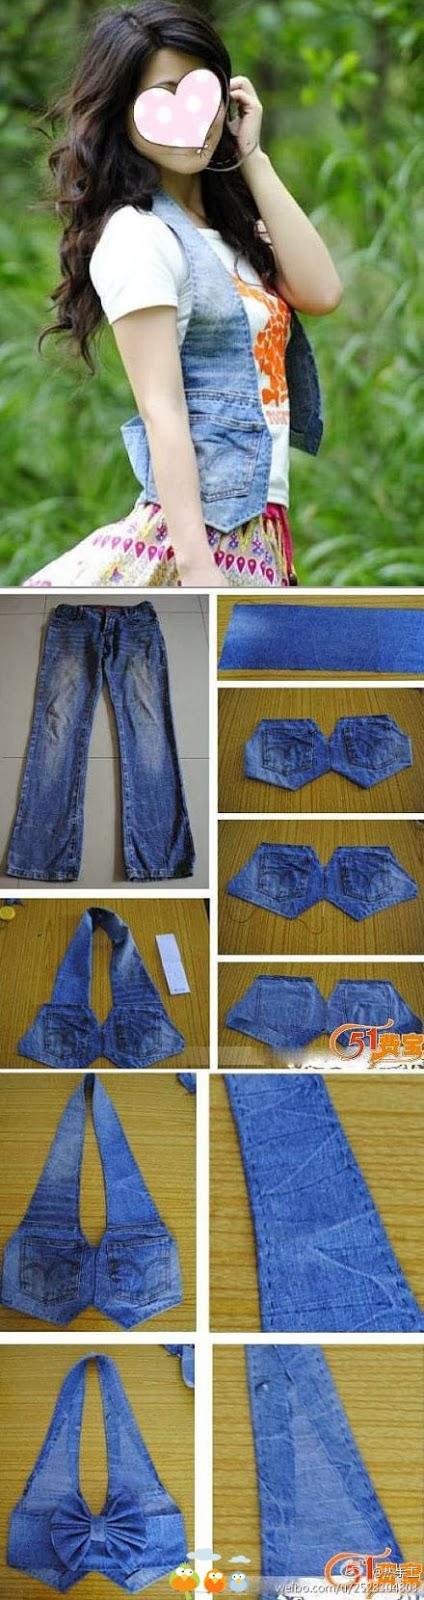 gilet-fai-da-te-Jeans-DIY-jacket